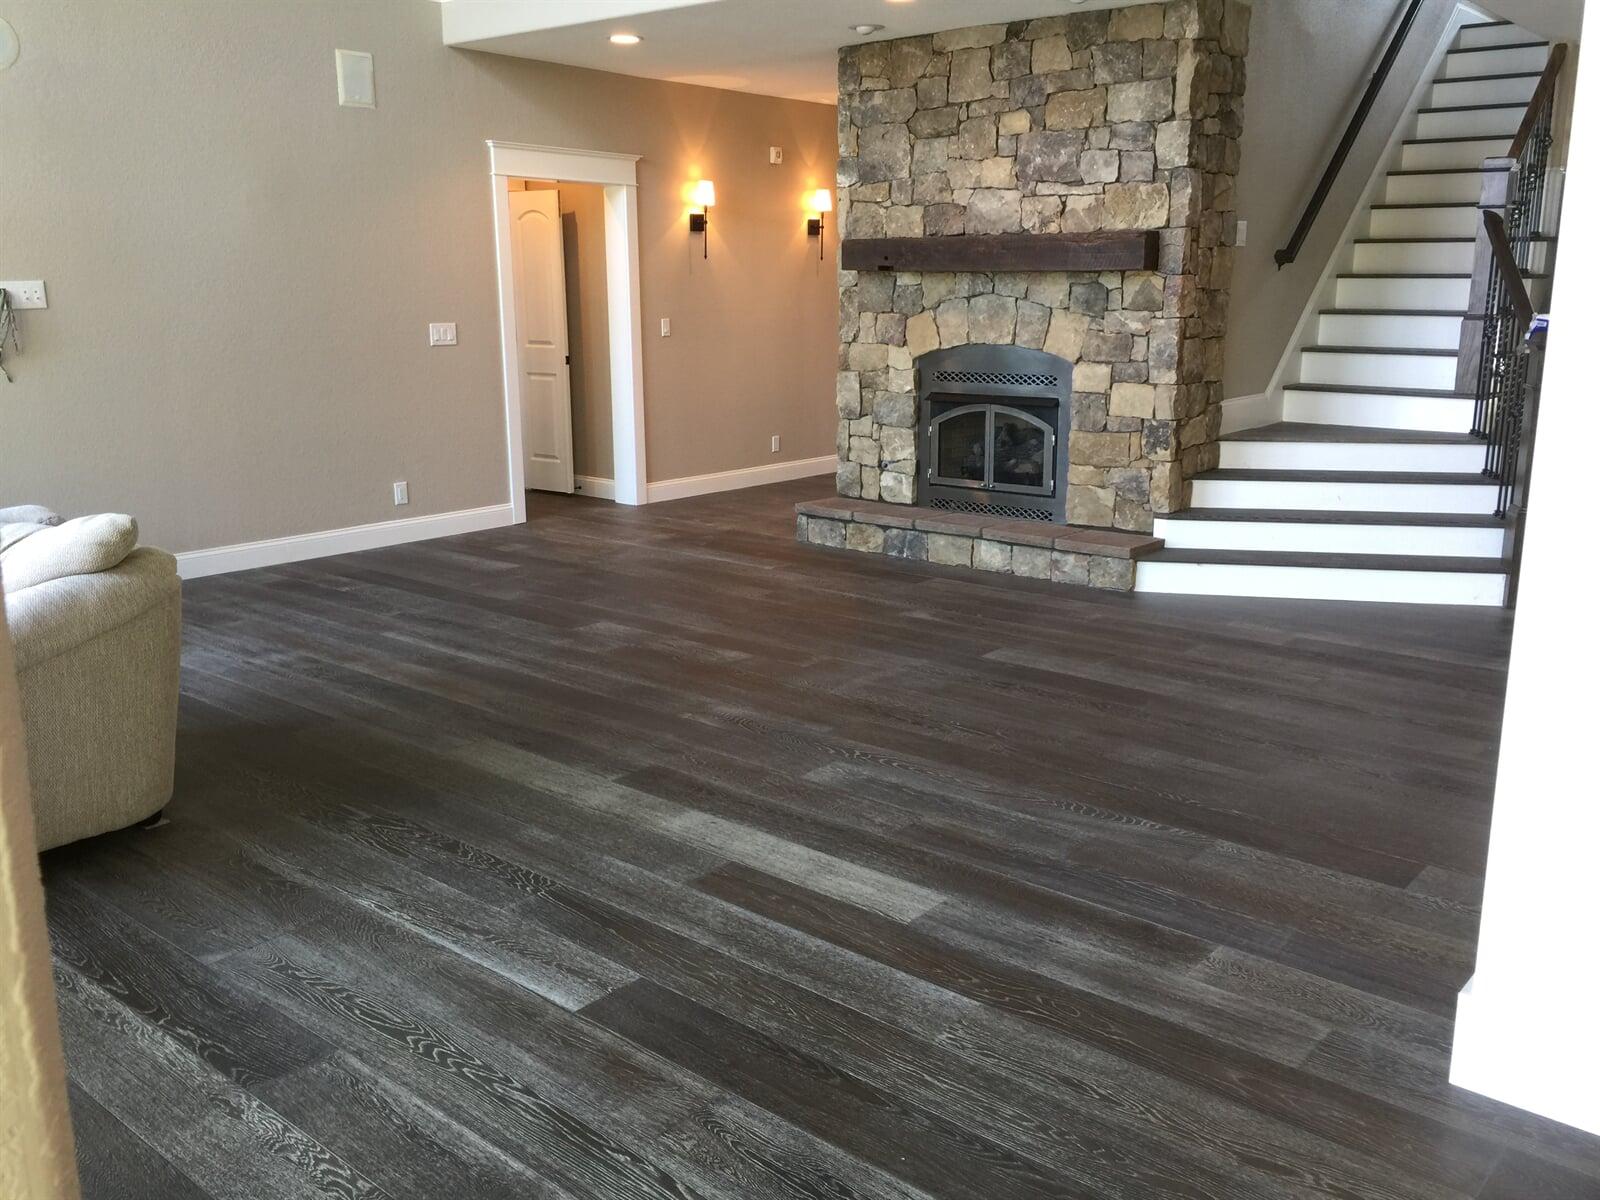 Modern wood look flooring in Lynchburg, VA from The Floor Source